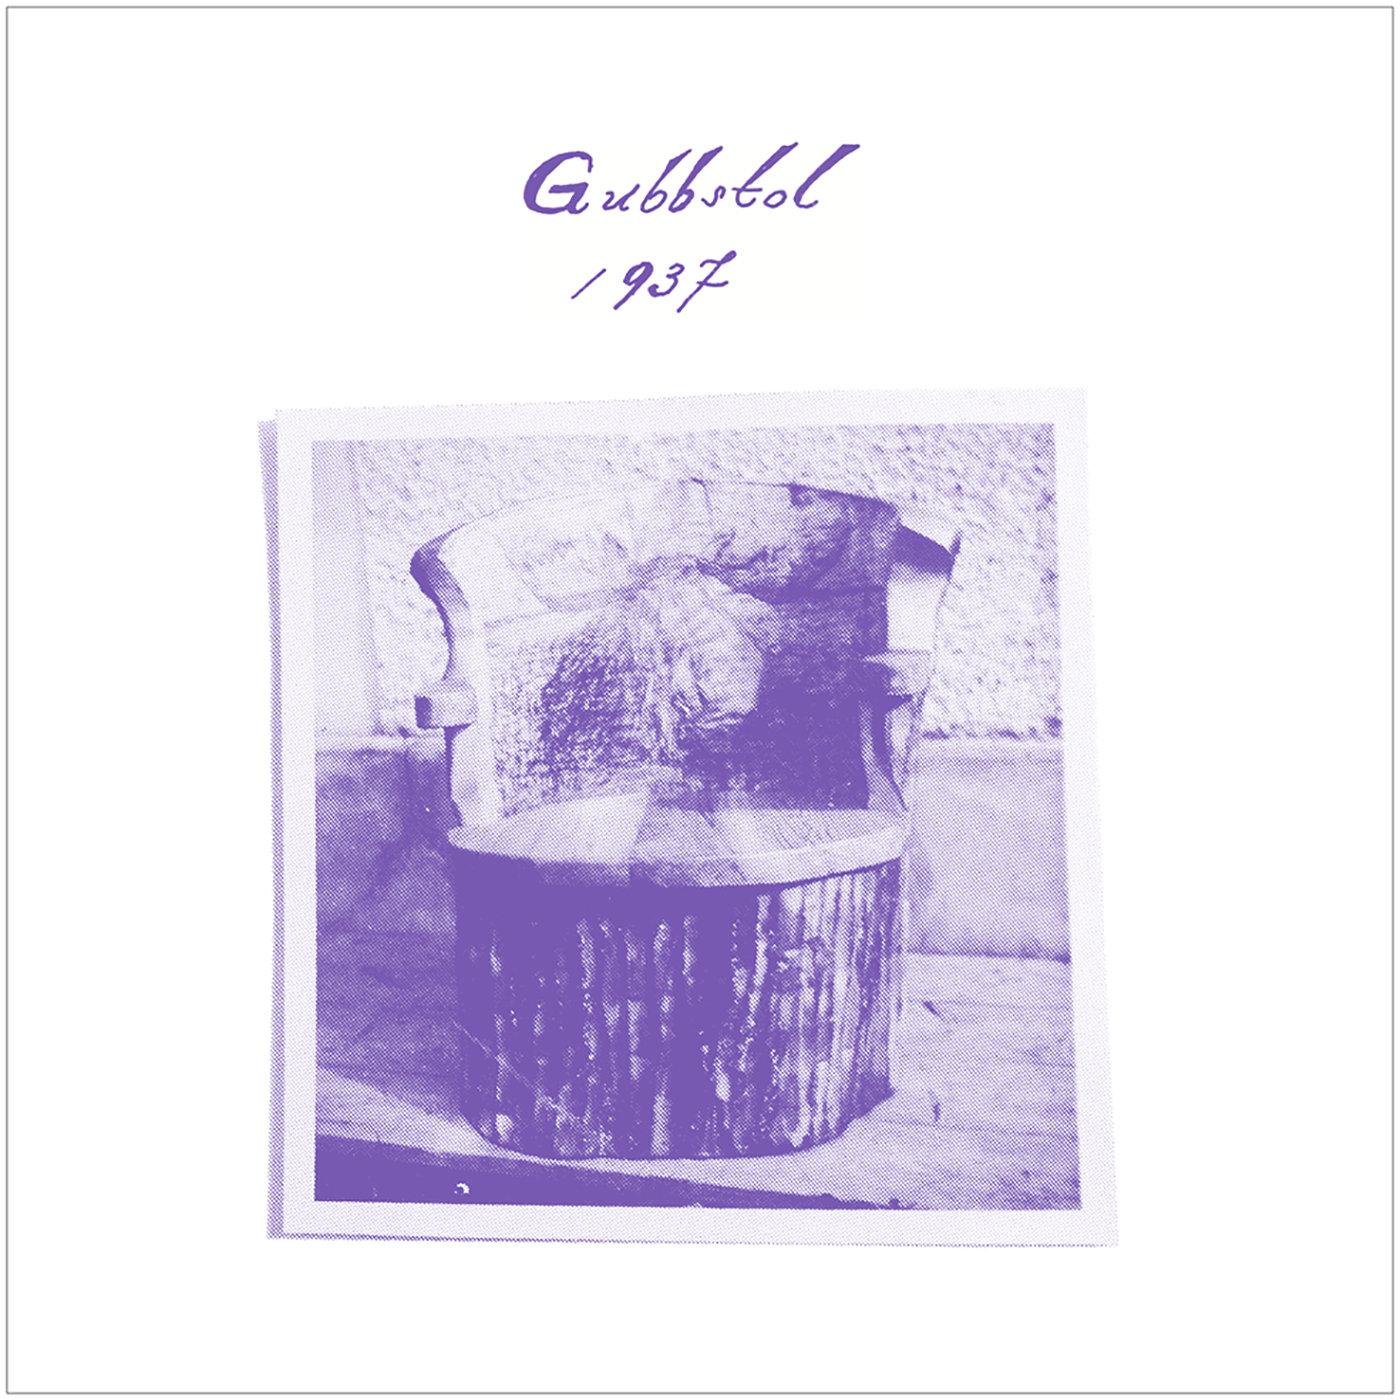 "Nils Berg & Mikael Augustsson - ""Gubbstol 1937"" LP 00007"